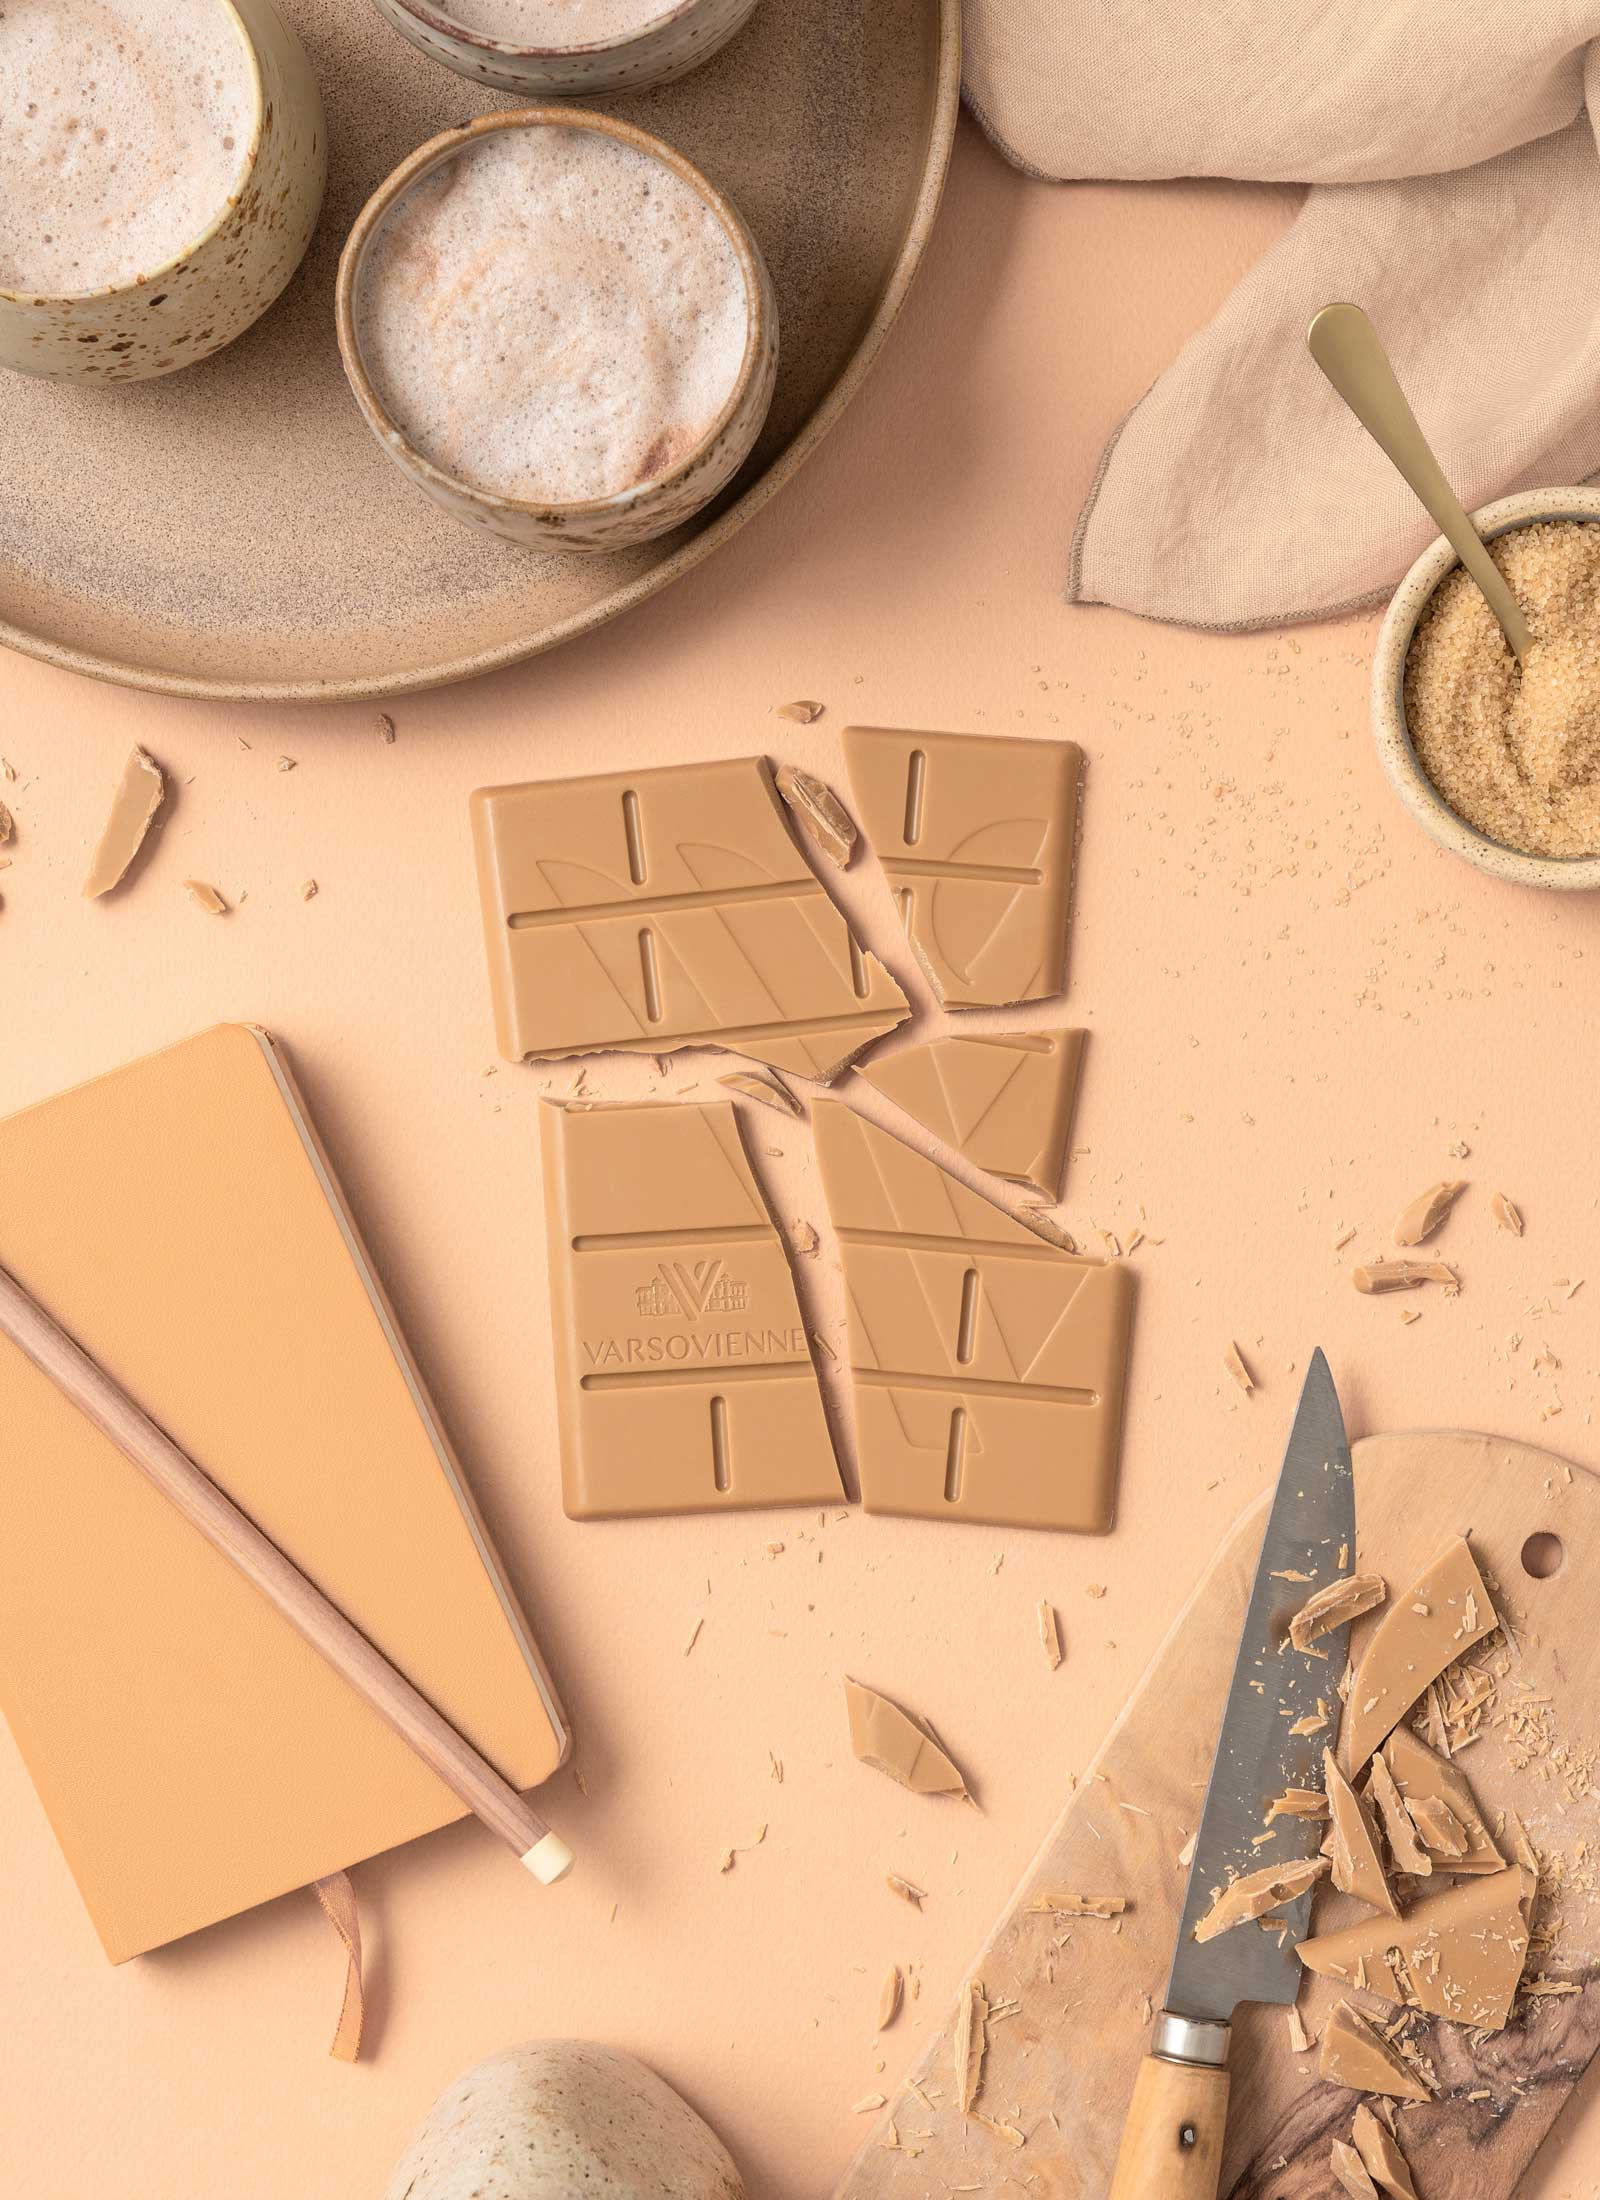 barras-still-life-chocolate-blanco-varsovienne-estudio-como